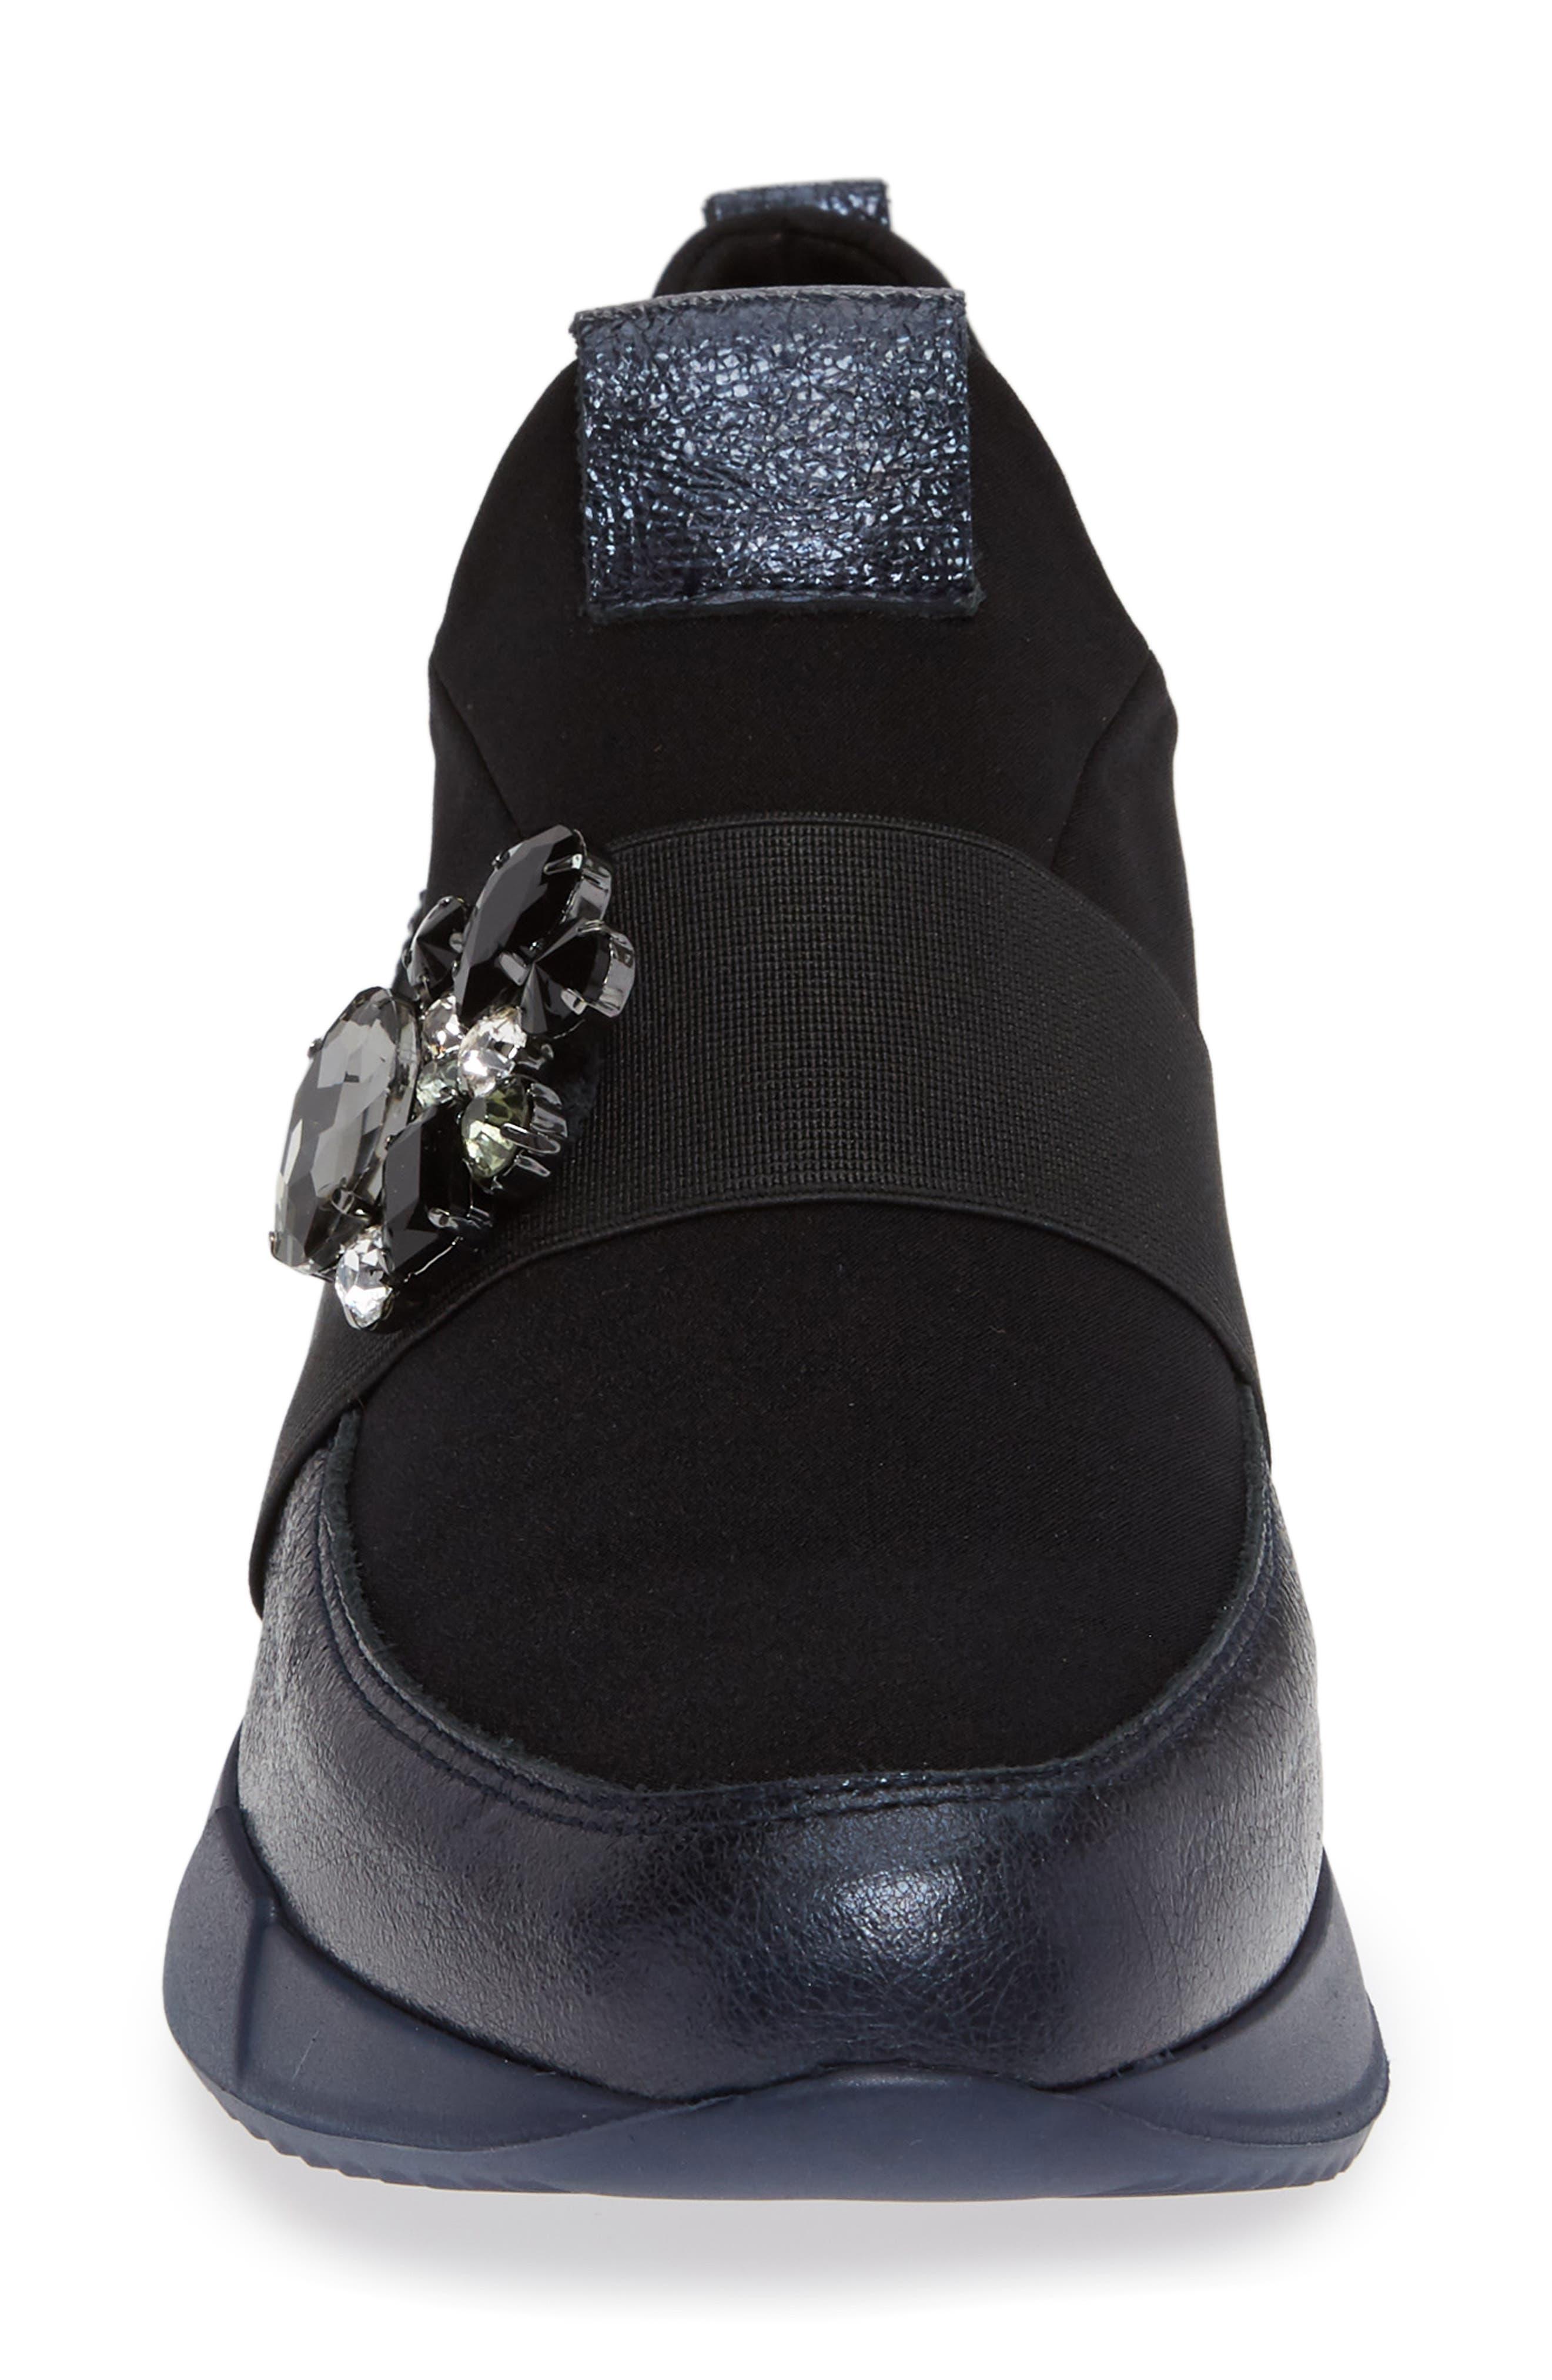 Callen Embellished Sock Sneaker,                             Alternate thumbnail 4, color,                             SHADOW MARINE LEATHER